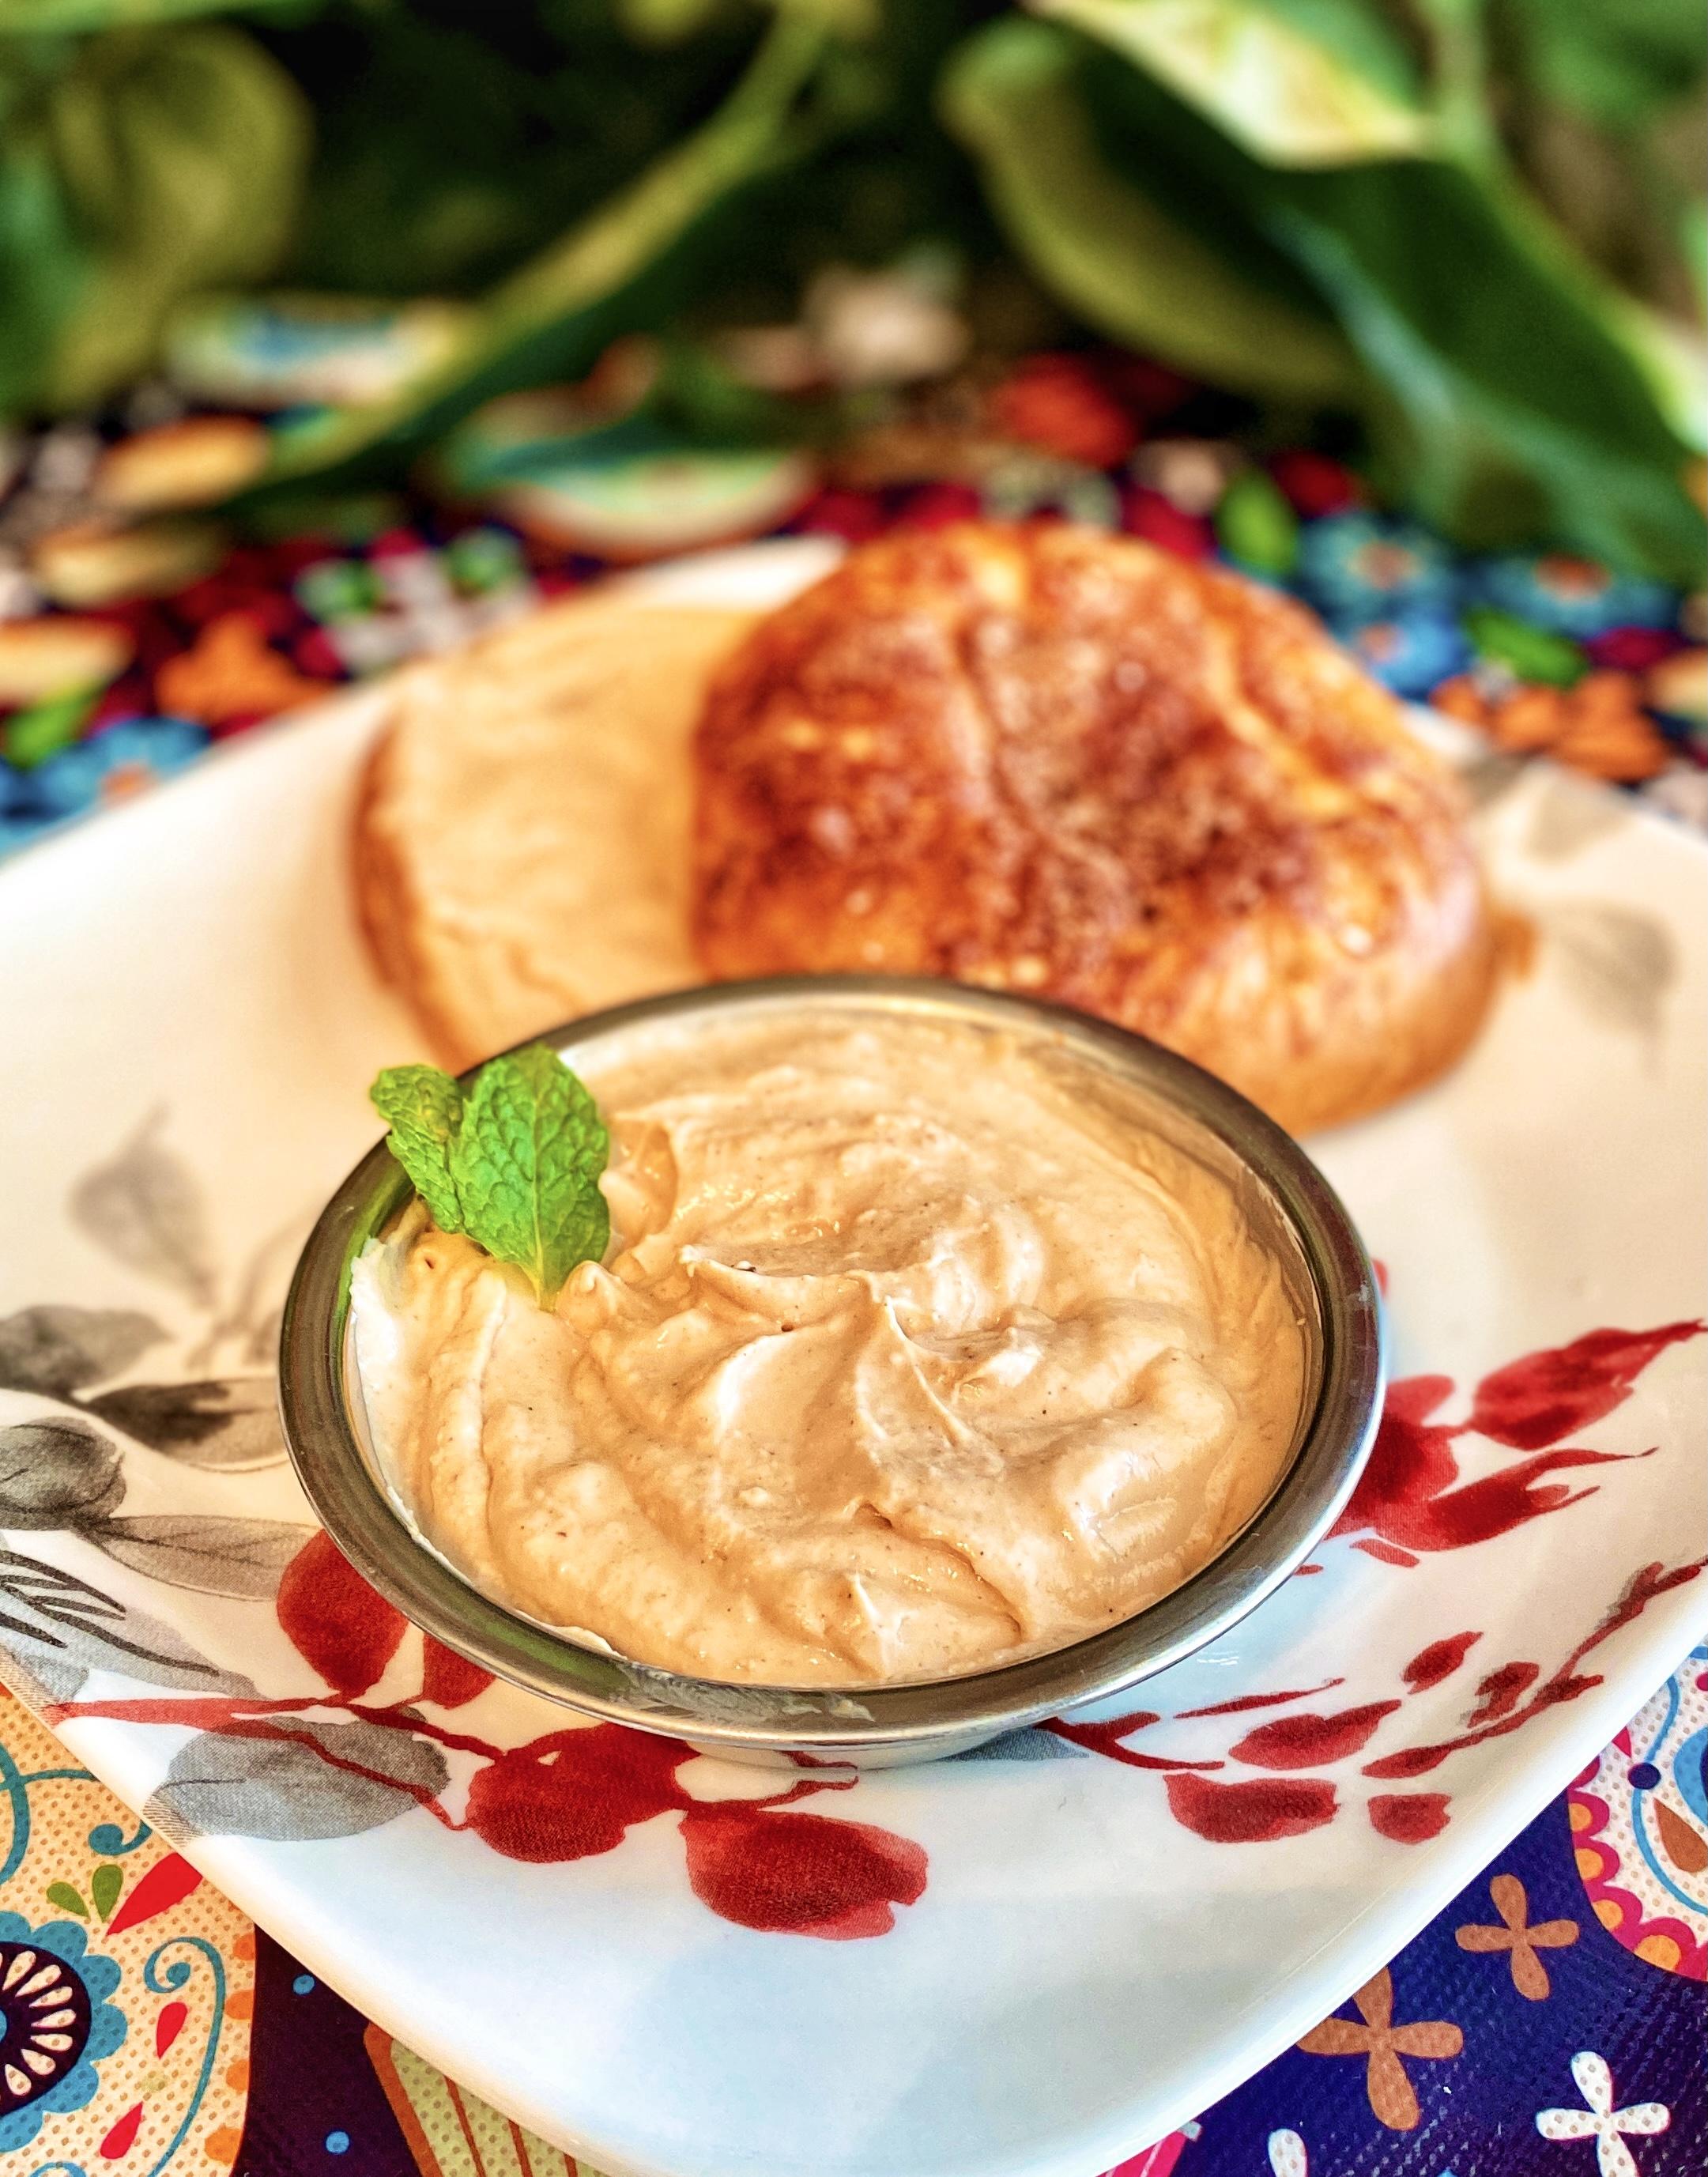 Apple Butter Cream Cheese Spread